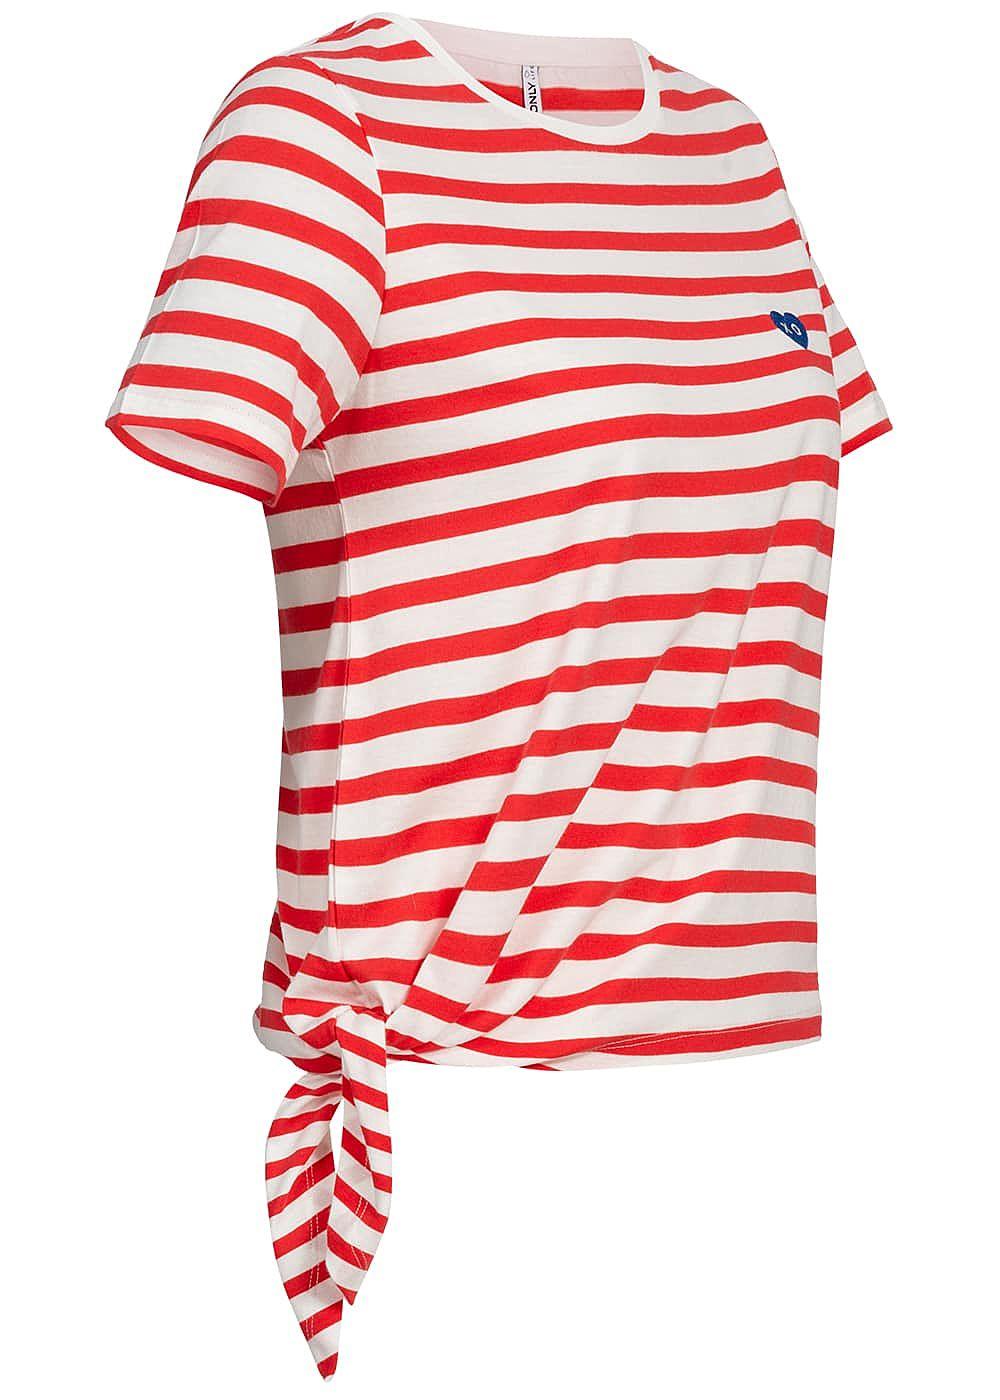 6854a314af0ae7 ONLY Damen T-Shirt Streifen Muster rot weiß - 77onlineshop